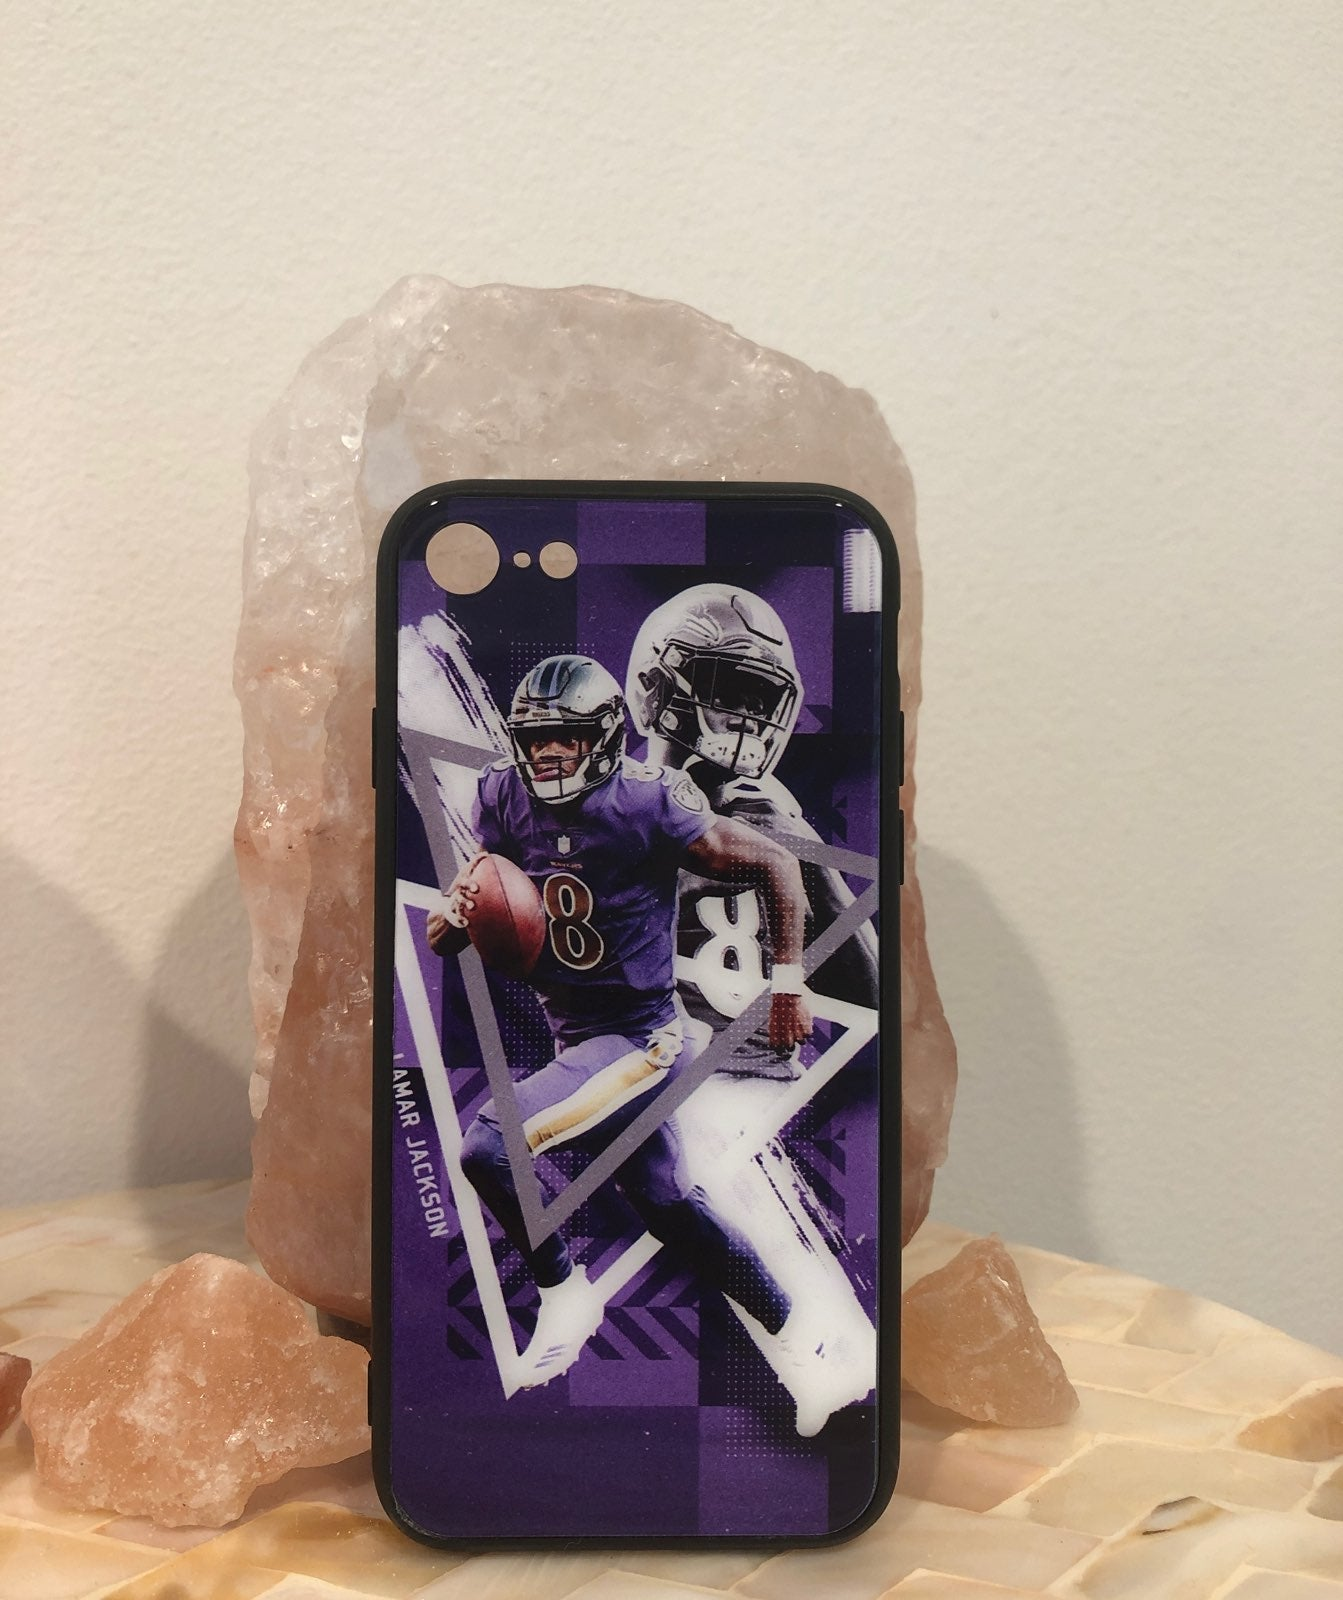 lamar jackson phone case